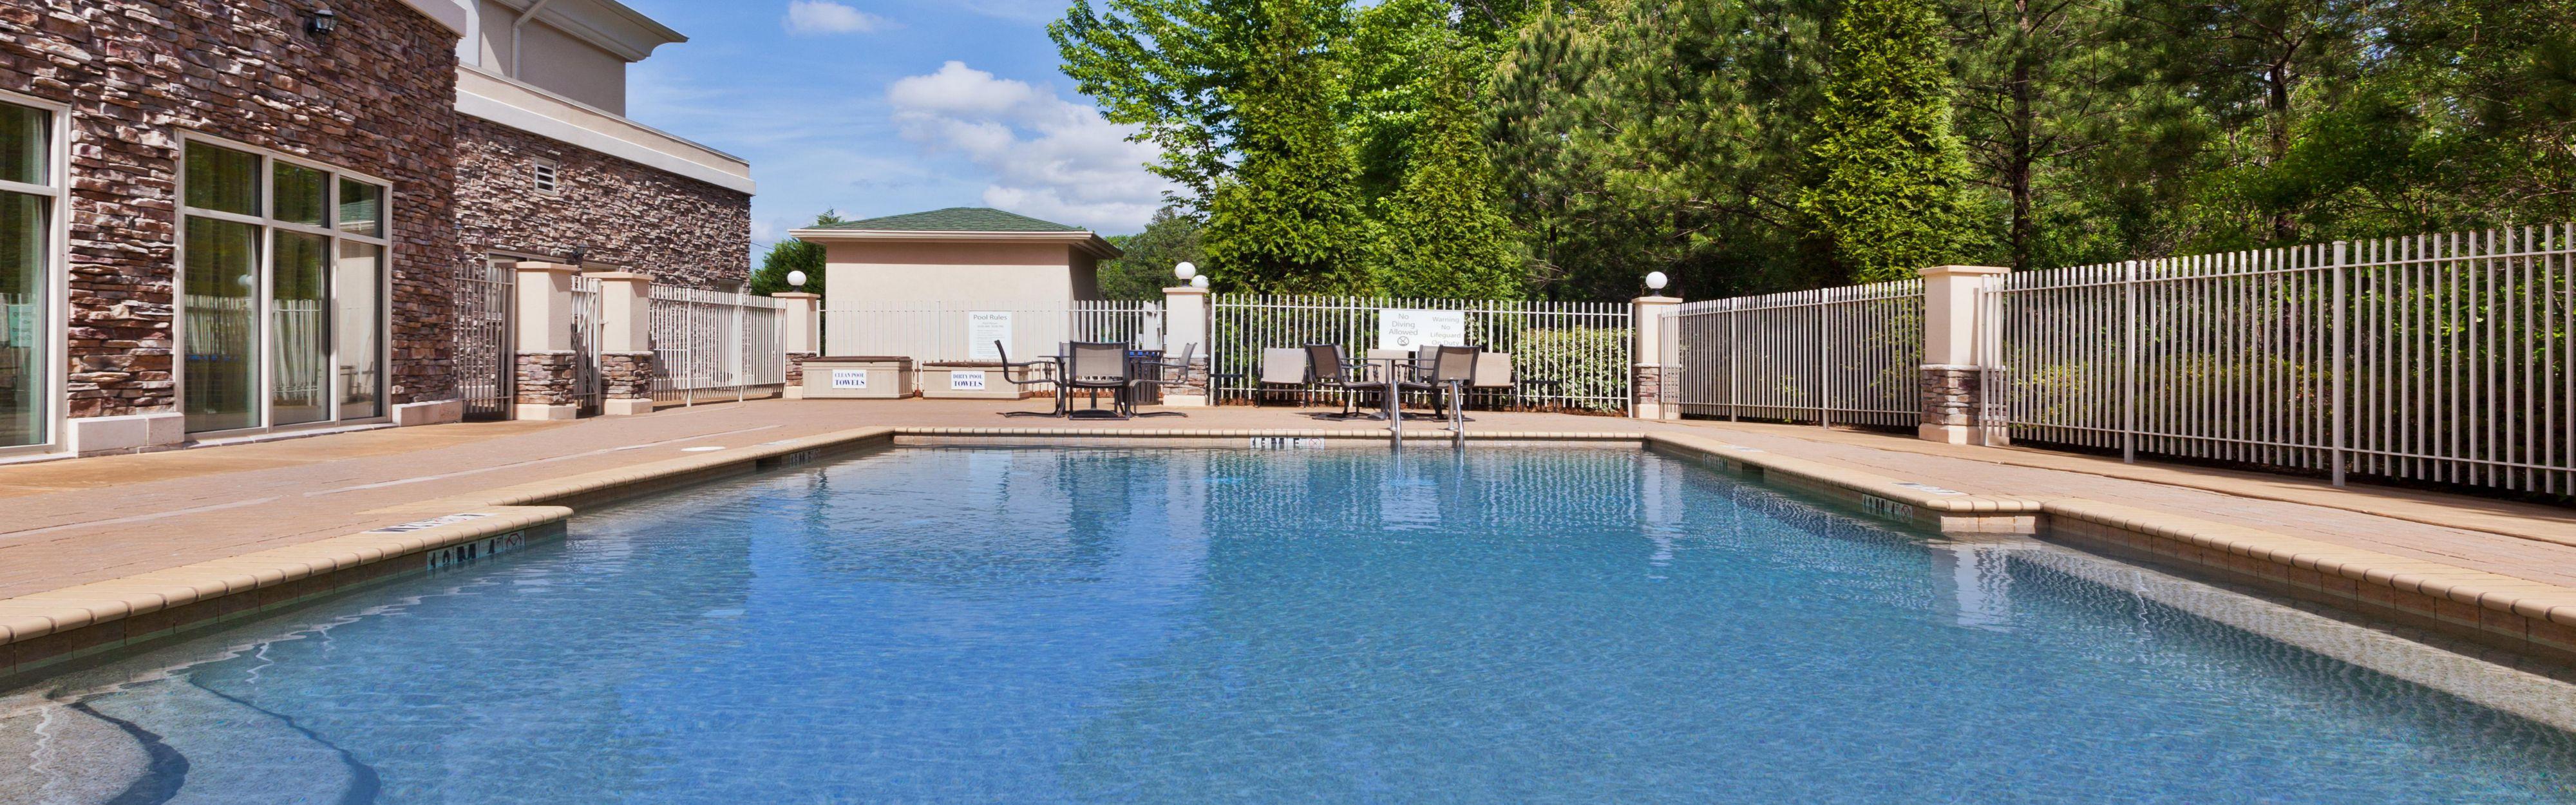 Holiday Inn Express Phenix City-Ft.Benning Area image 2